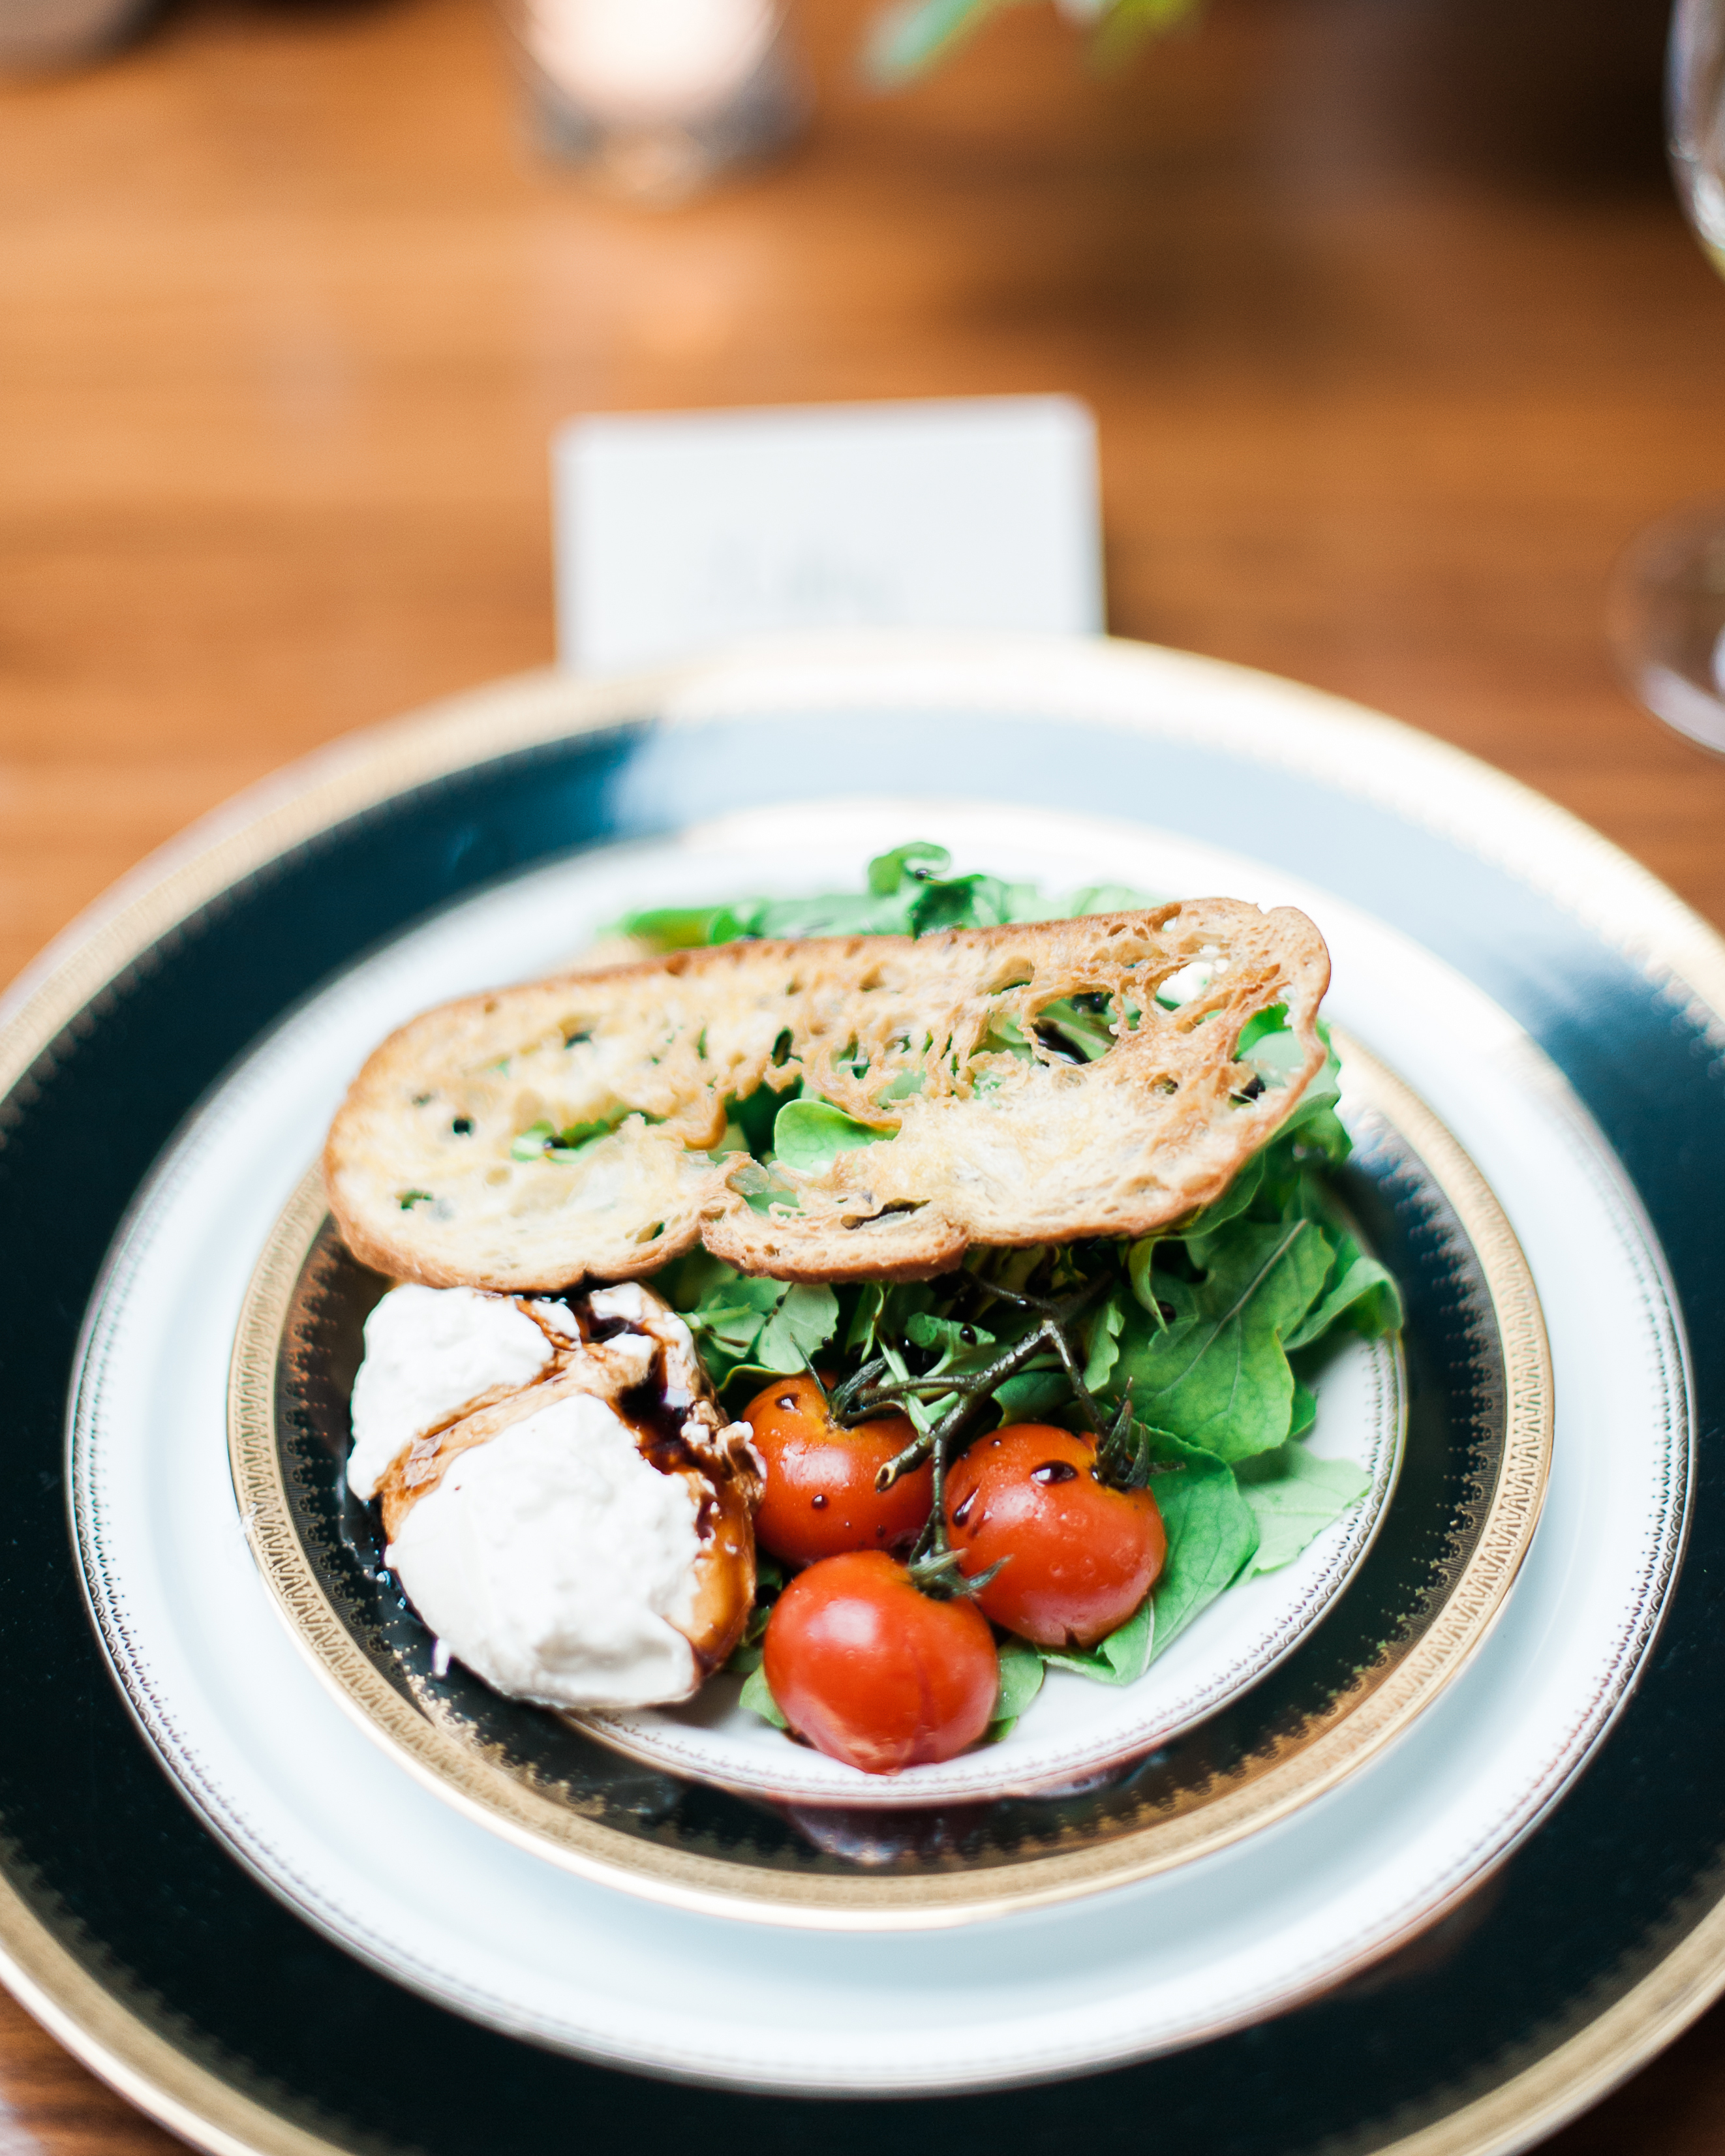 ashley-jonathon-wedding-salad-66-s111483-0914.jpg